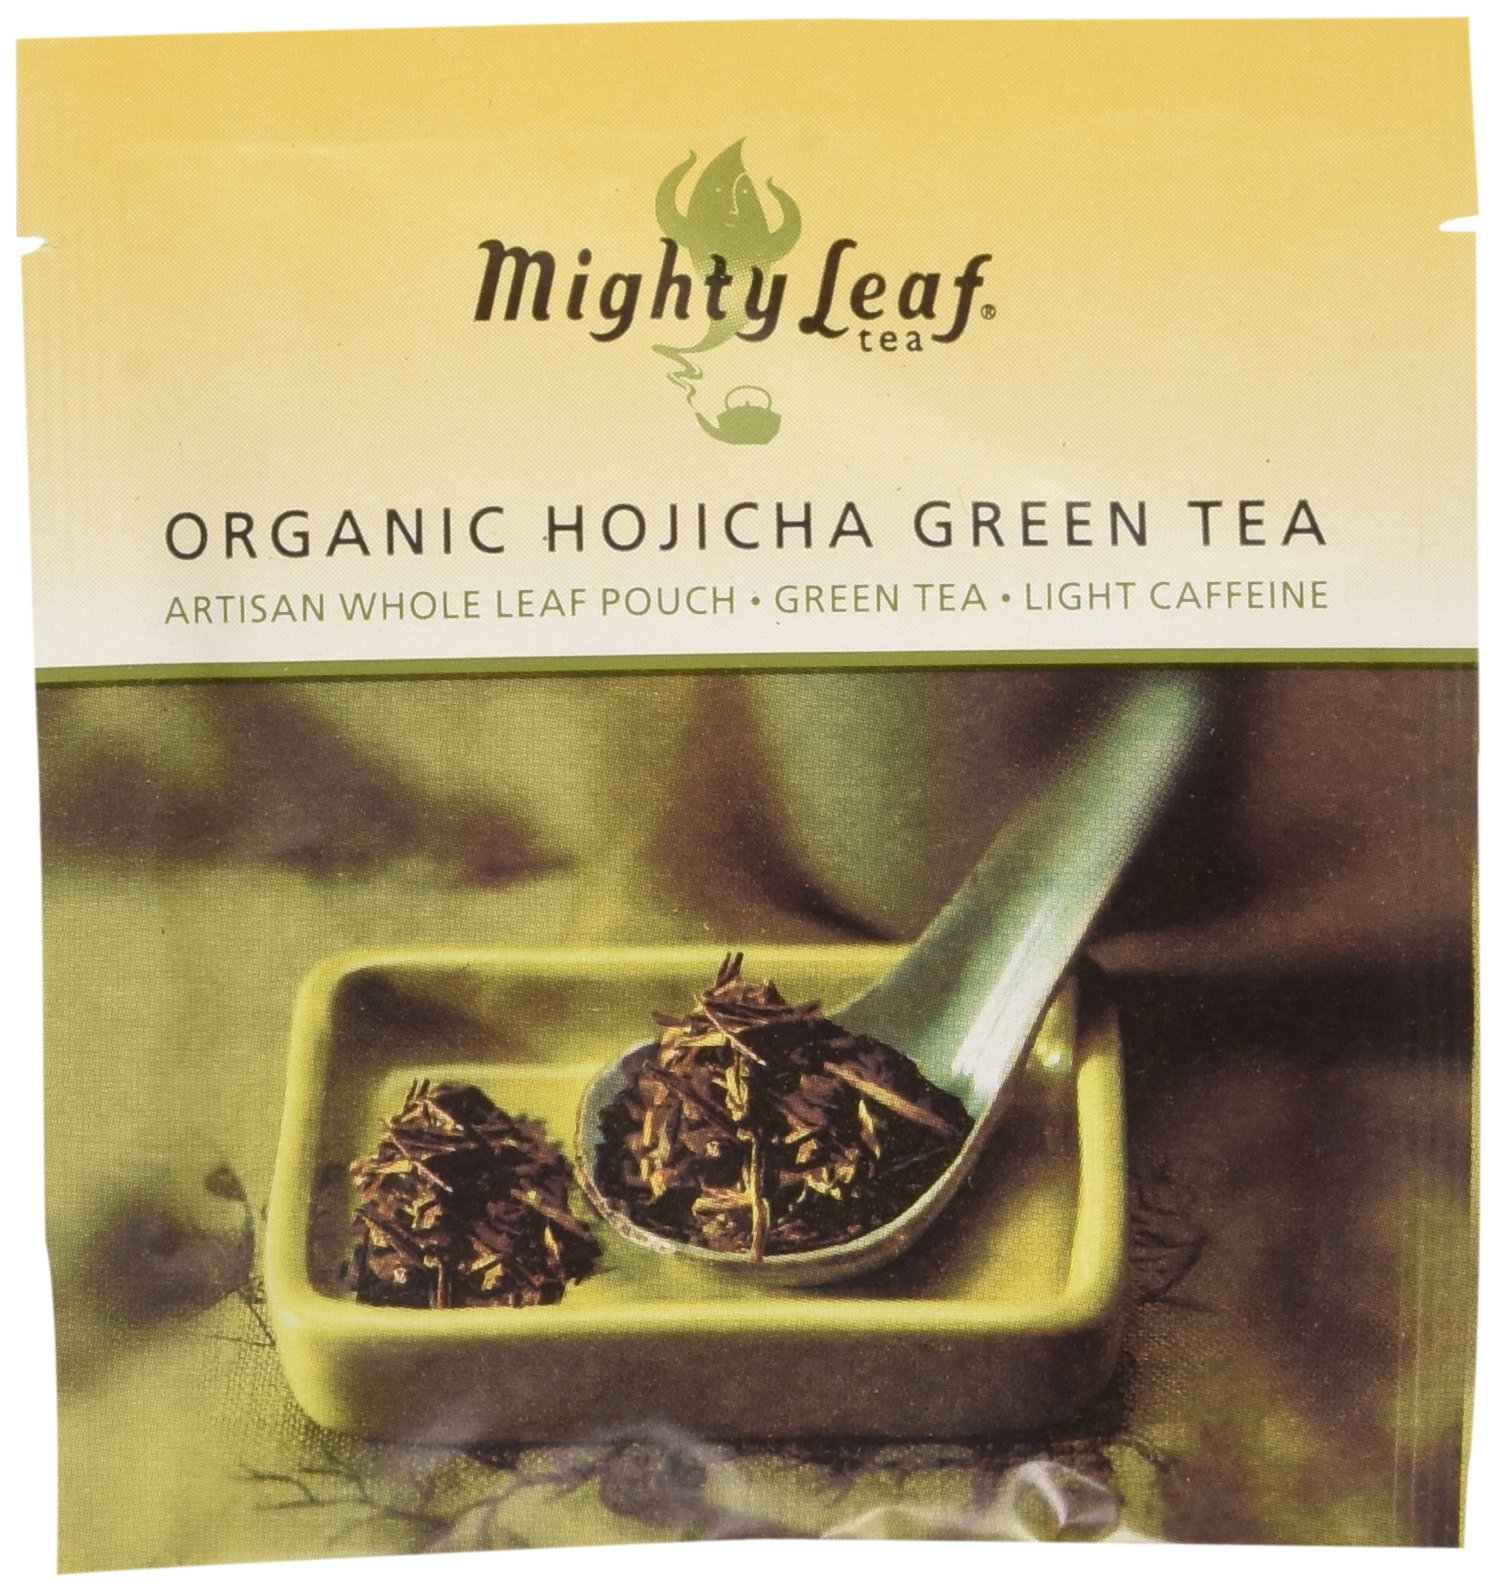 CDM product Mighty Leaf Organic Hojicha Green Tea, 100 Tea Pouches big image